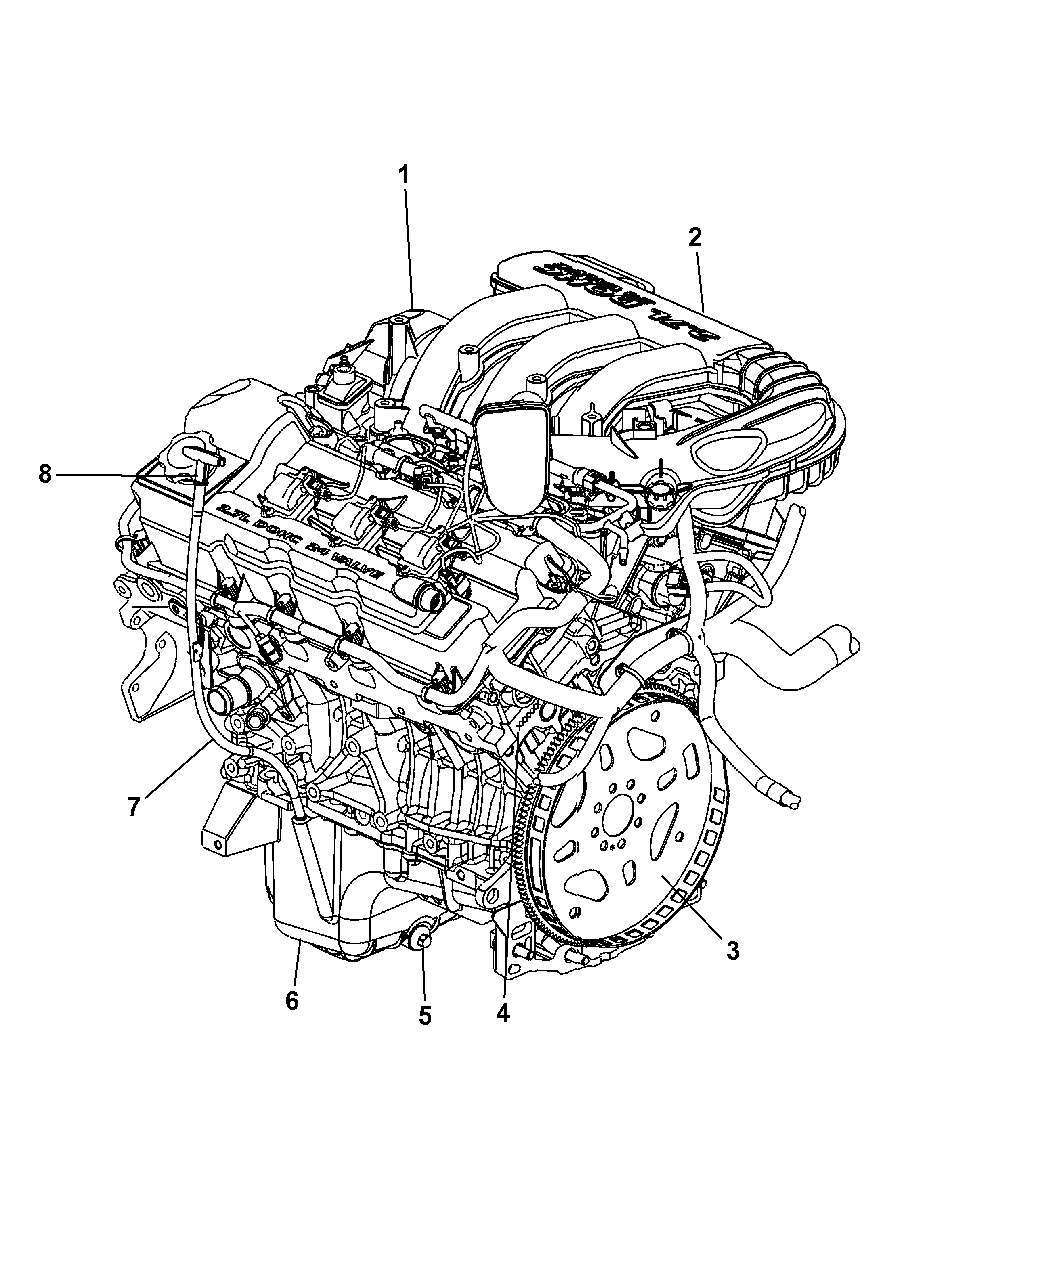 2007 Dodge Magnum Engine Assembly Identification Service Diagram Thumbnail 1